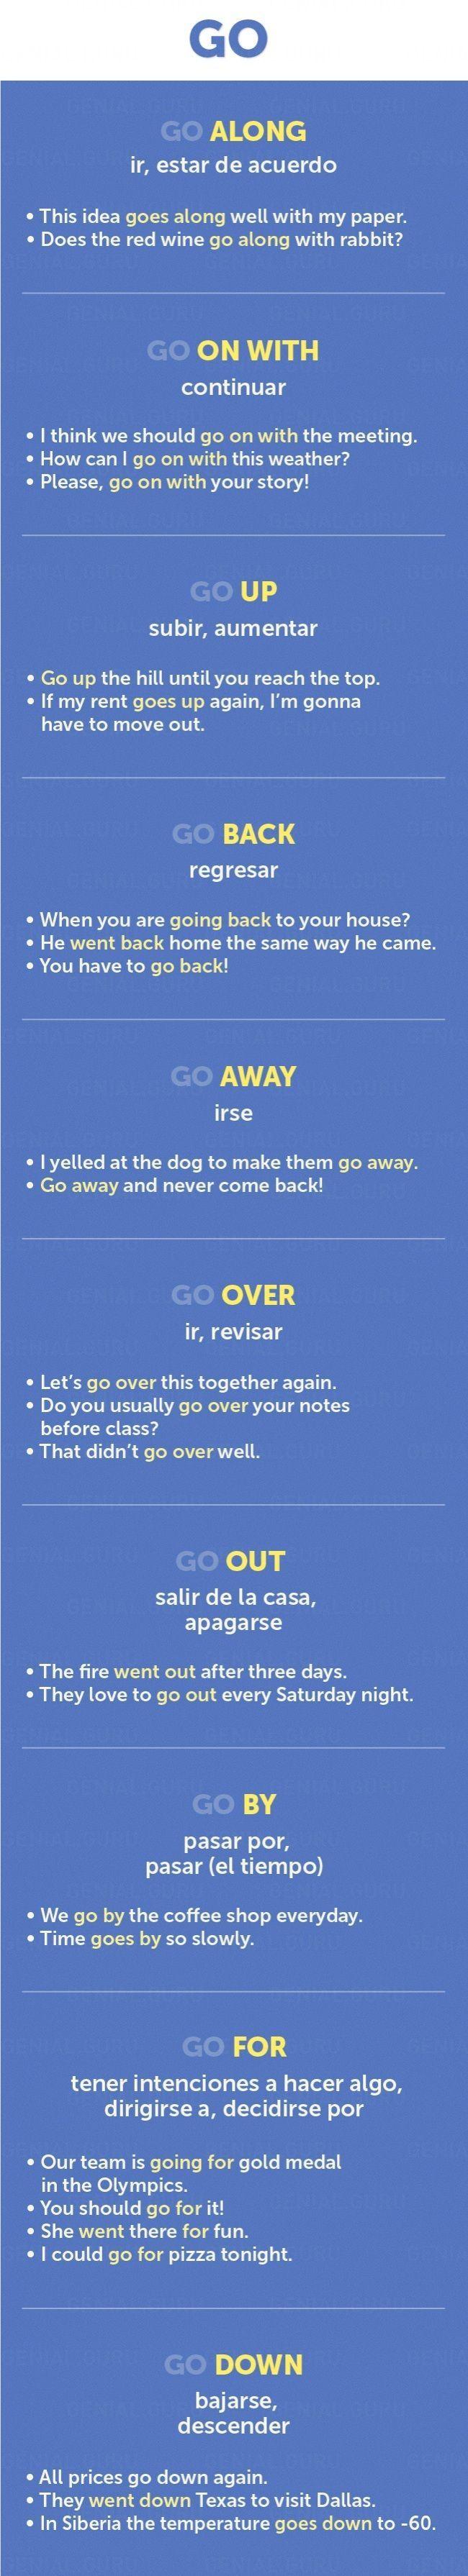 Megapost: Aprendes Ingles? Tablas con Frases,Verbos... - Taringa!